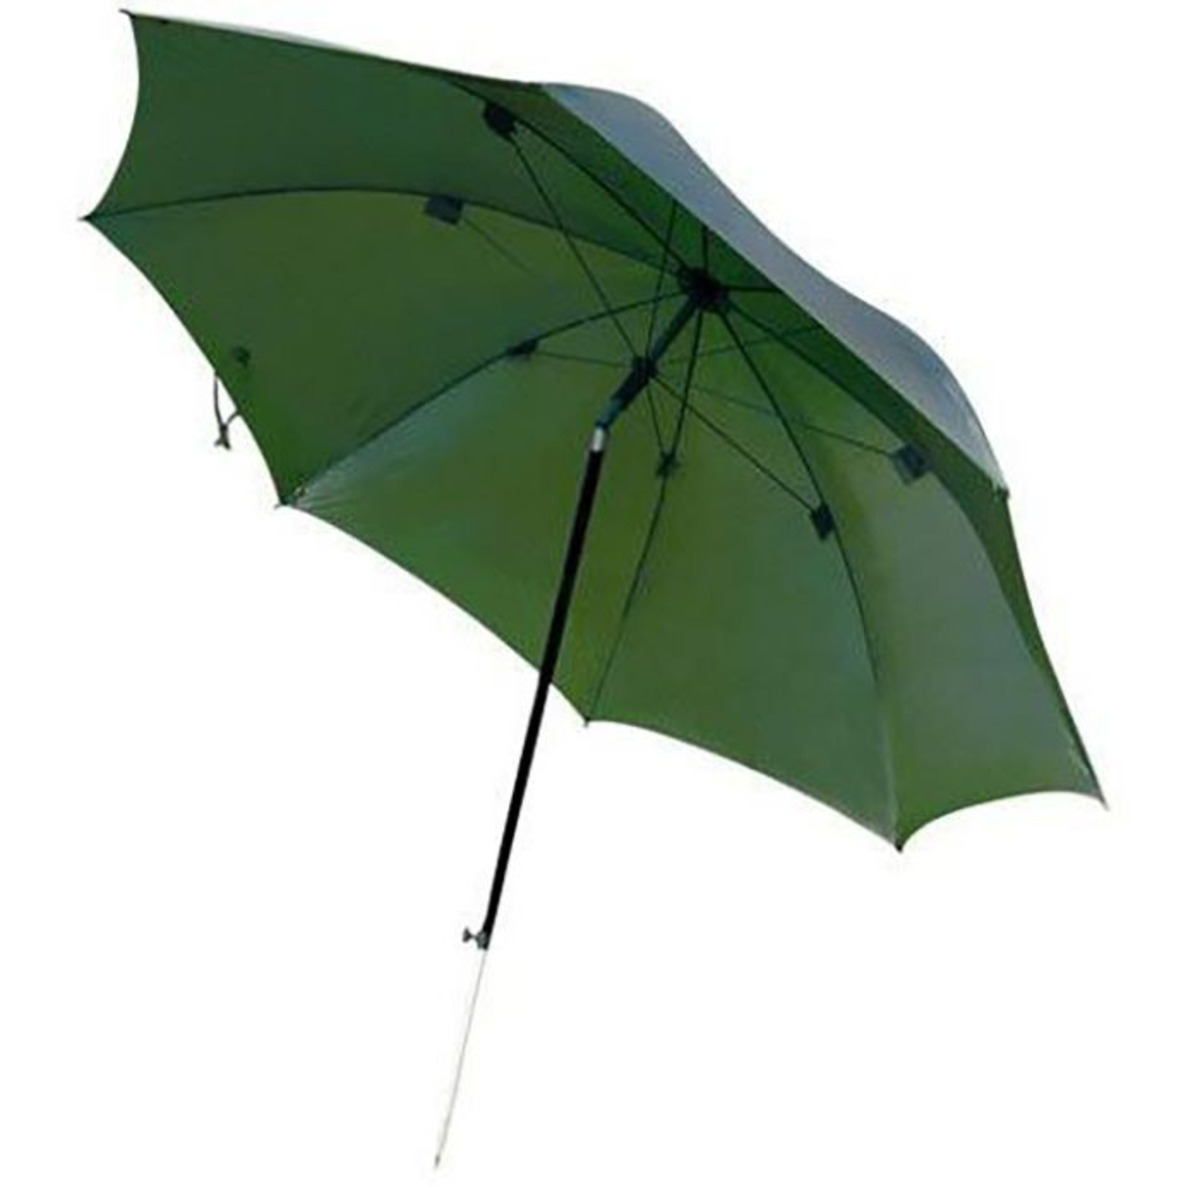 Zebco Nylon Umbrella - 2.20 m